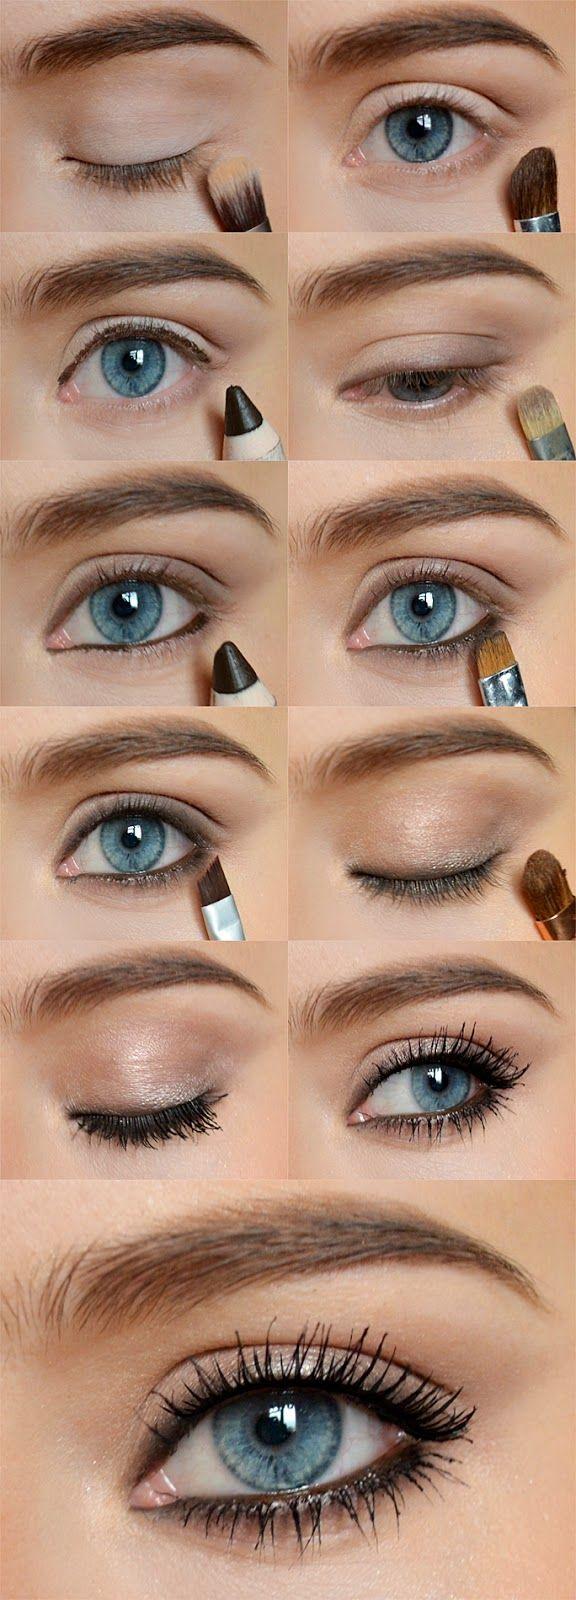 Best Ideas For Makeup Tutorials Emilyrosesaxon